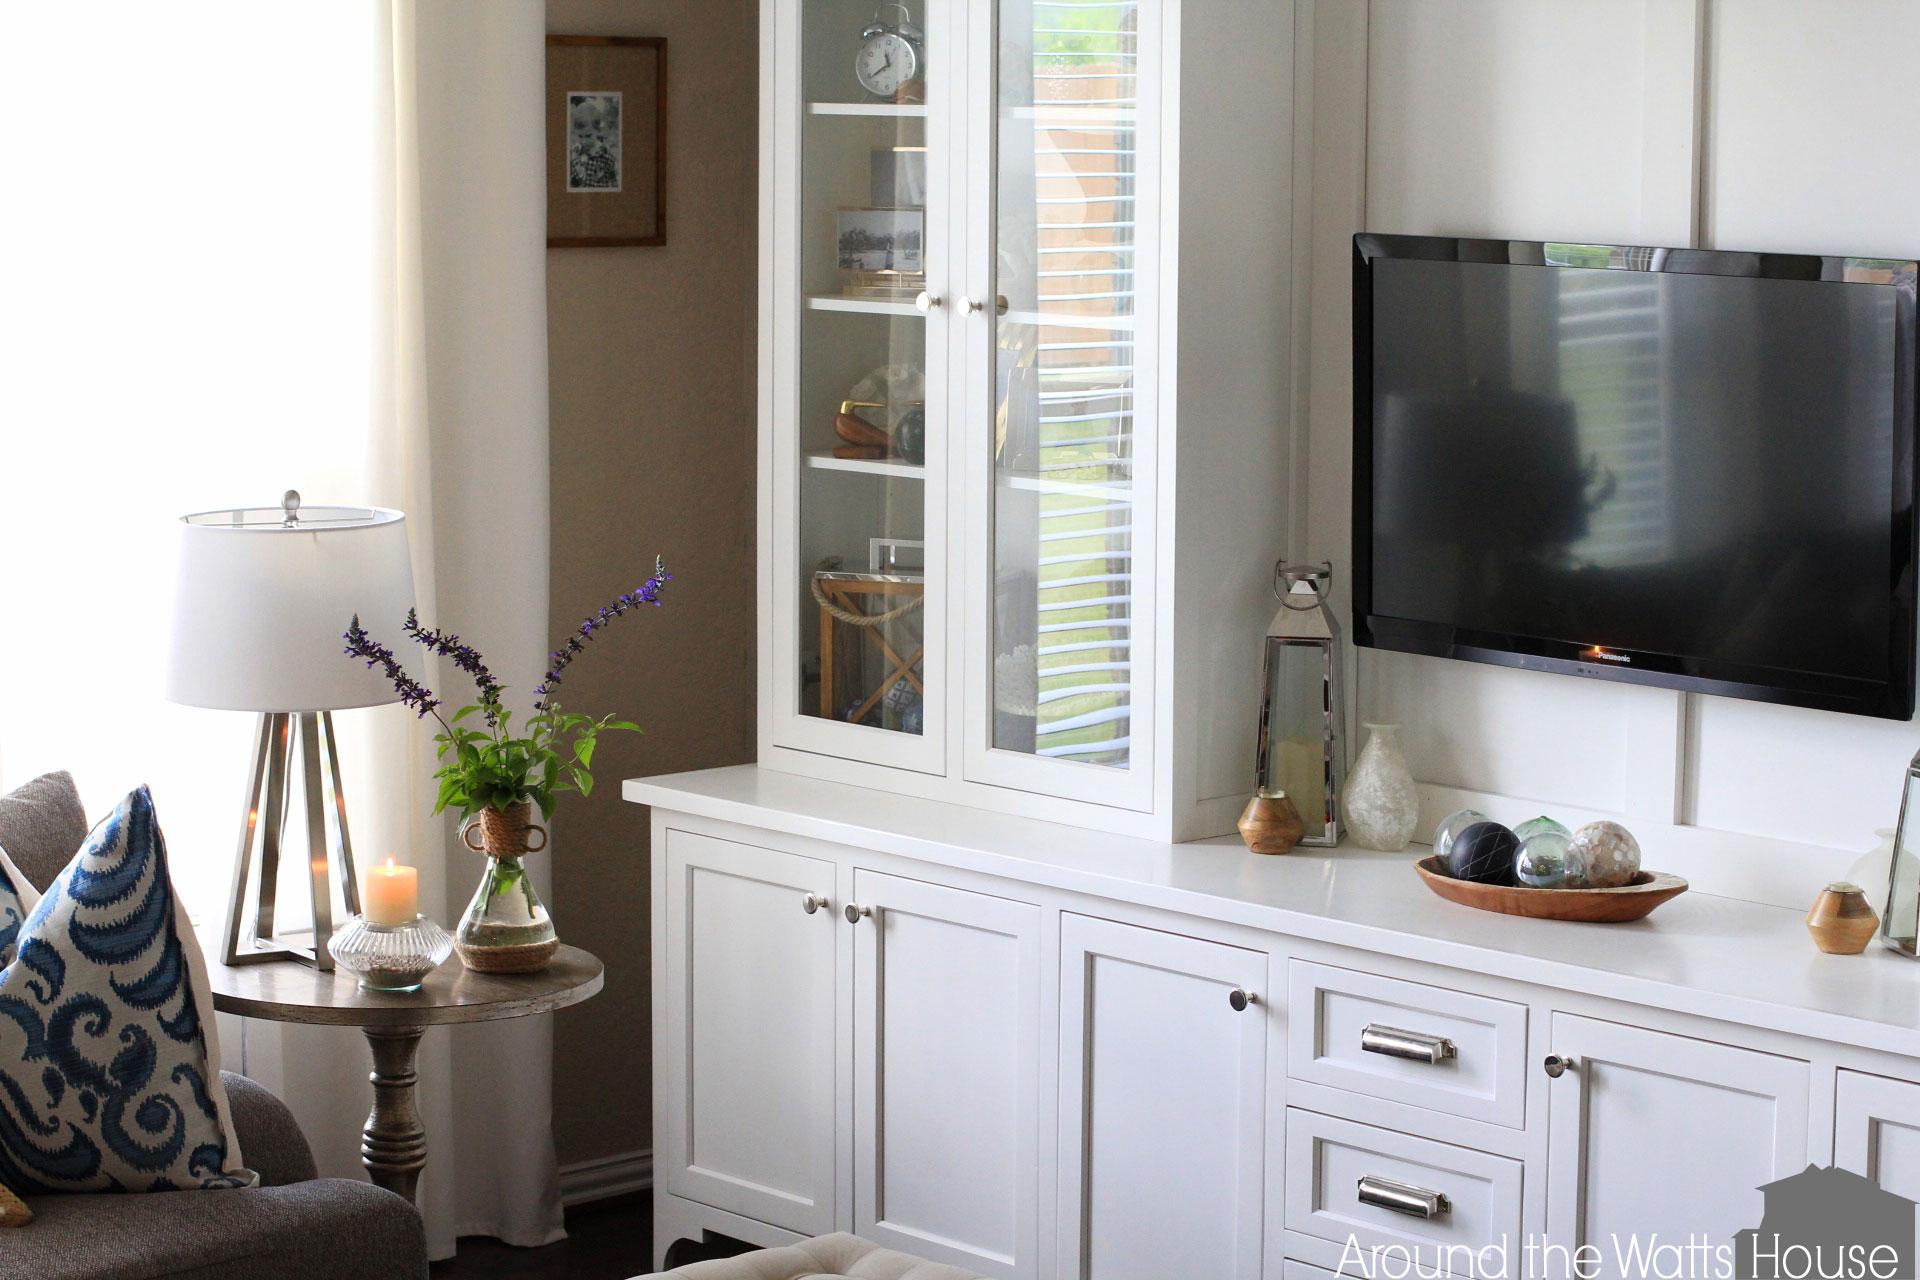 Living Room Built-in